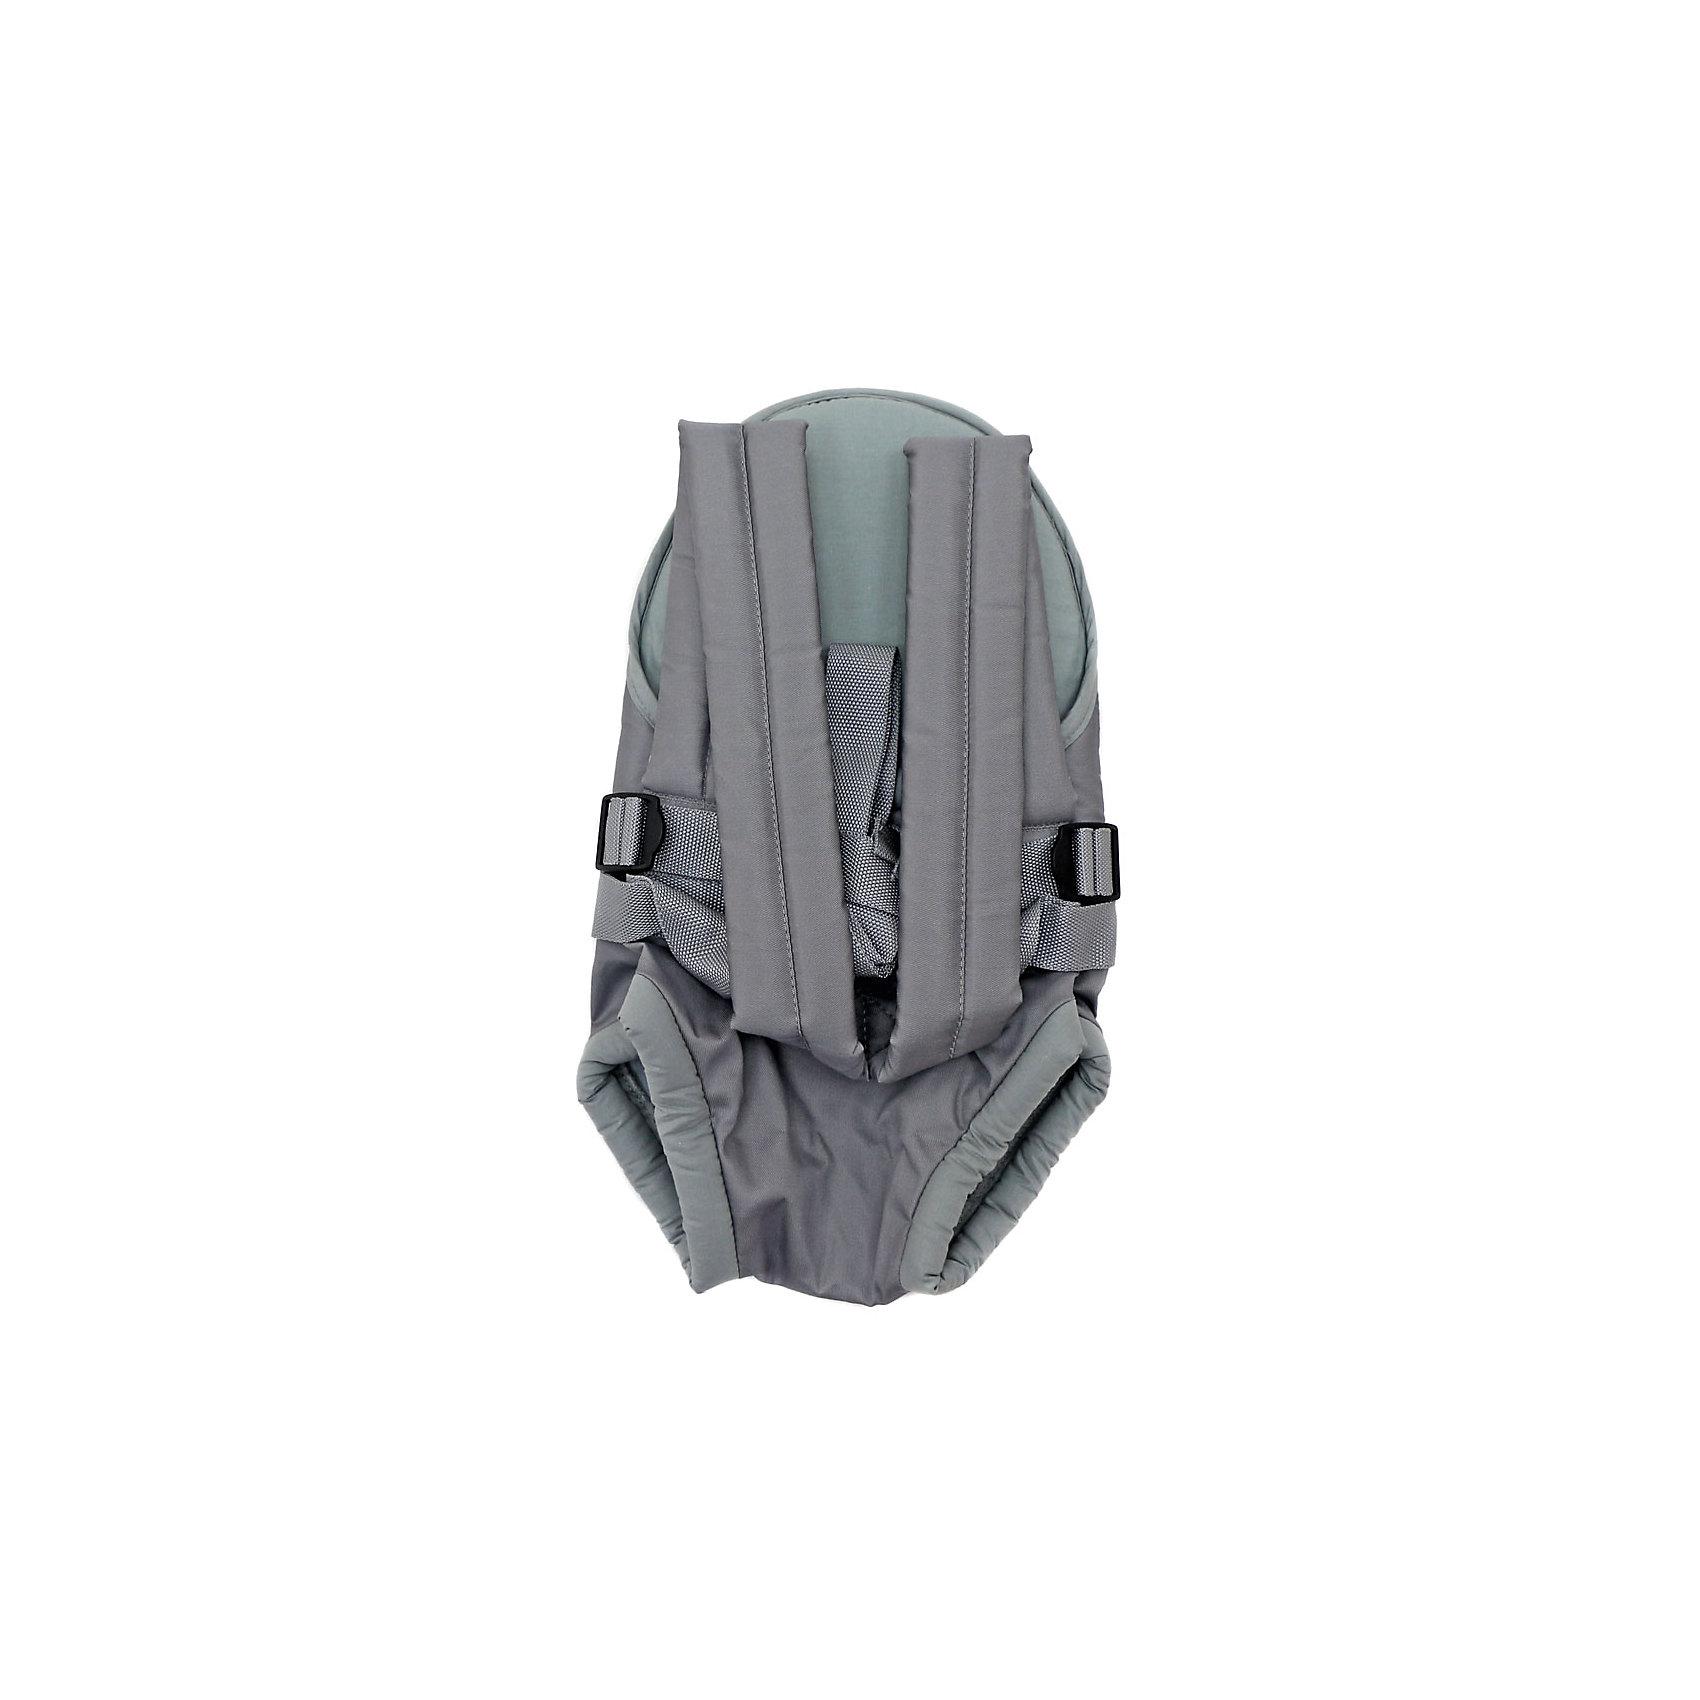 Рюкзак-кенгуру Классика, Топотушки, серый